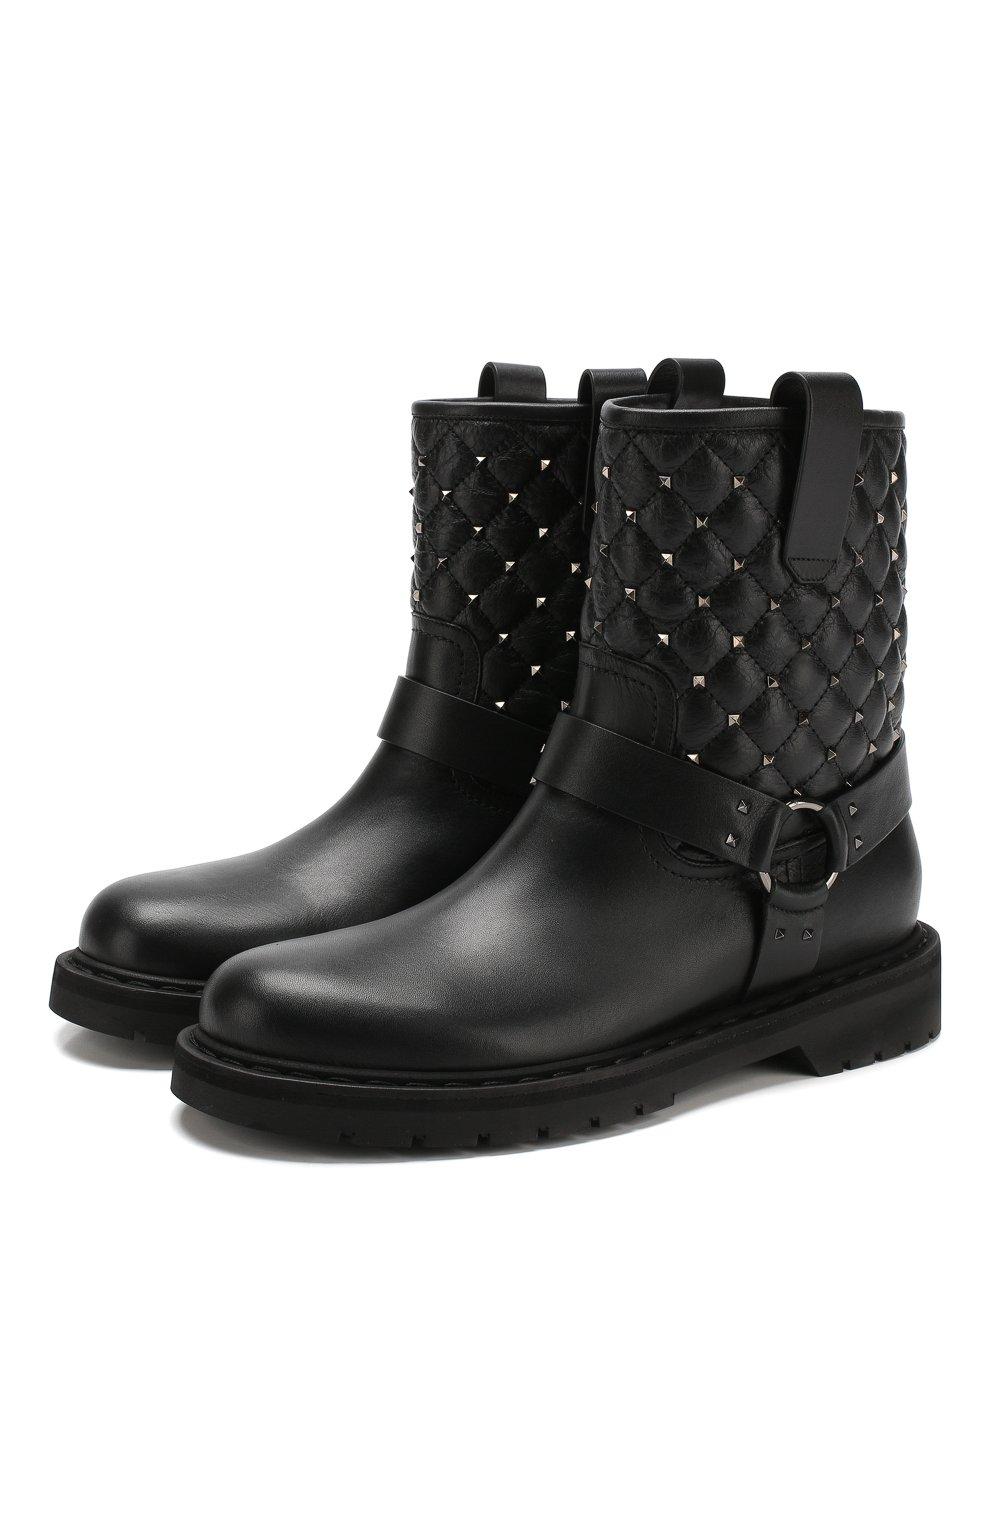 59fff536a4c9 Высокие кожаные ботинки Valentino Garavani Rockstud Spike   Фото №1